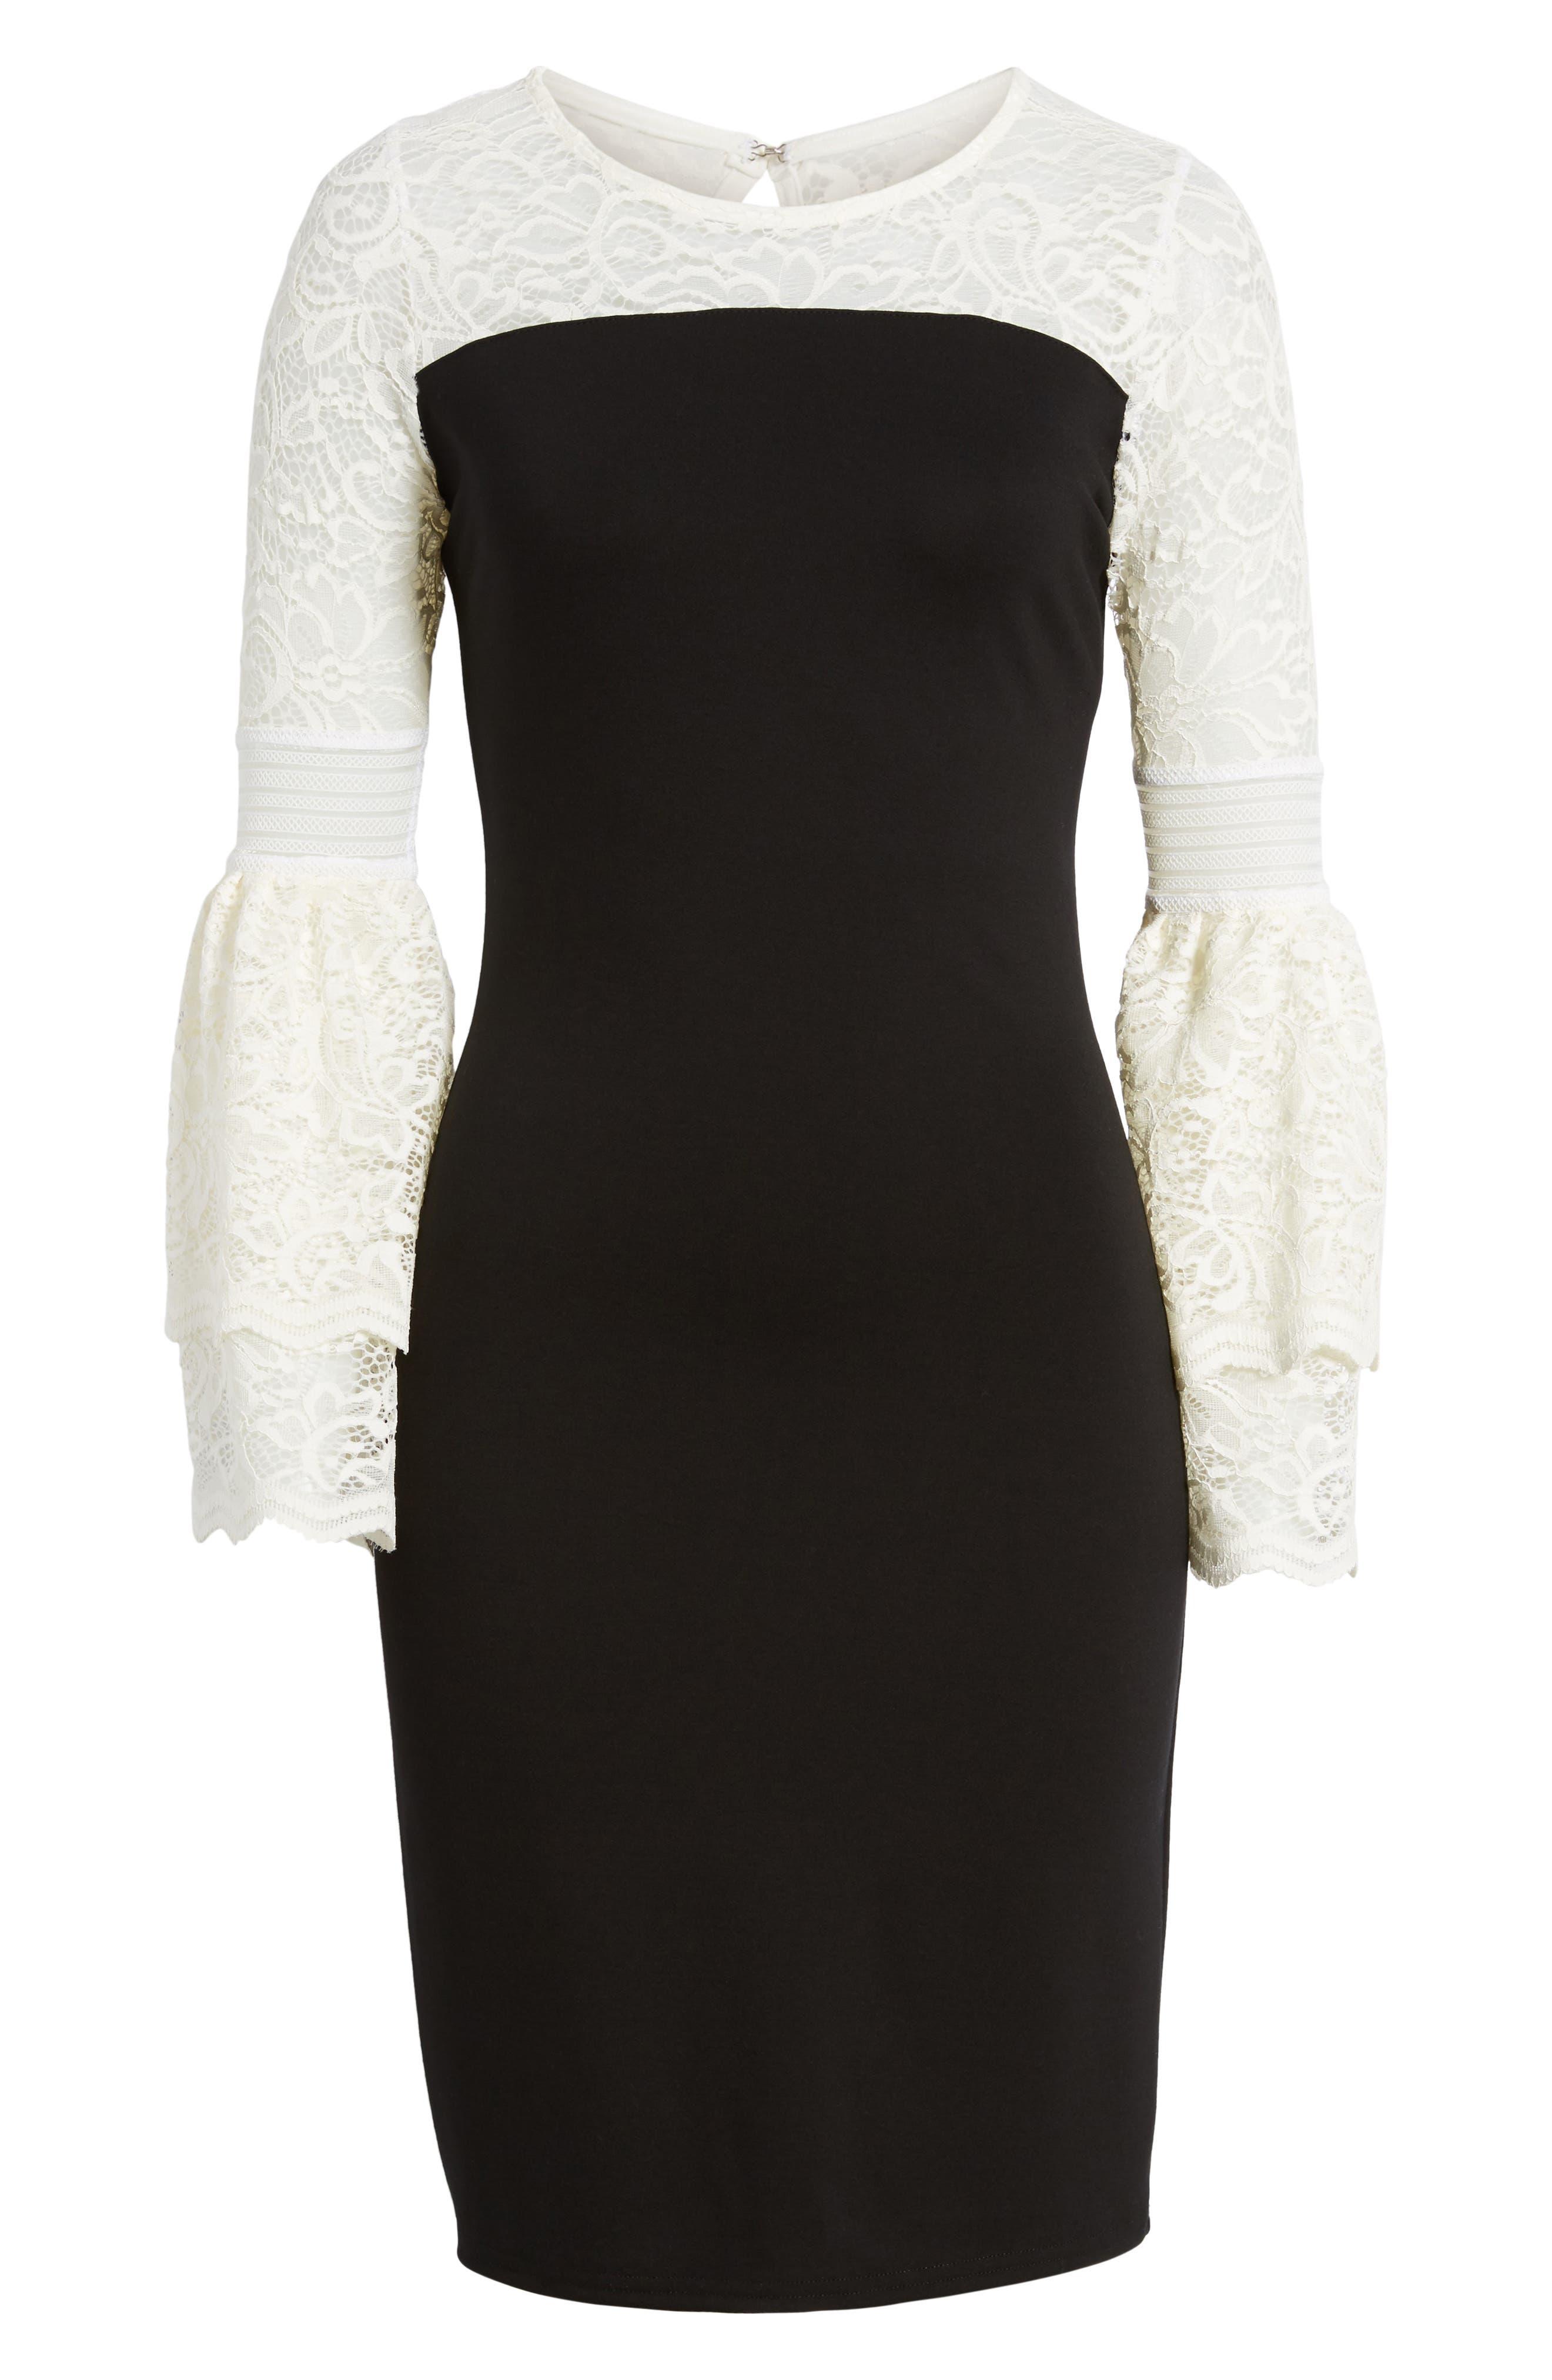 Floetry Bell Sleeve Sheath Dress,                             Alternate thumbnail 6, color,                             Cream Lace/ Black